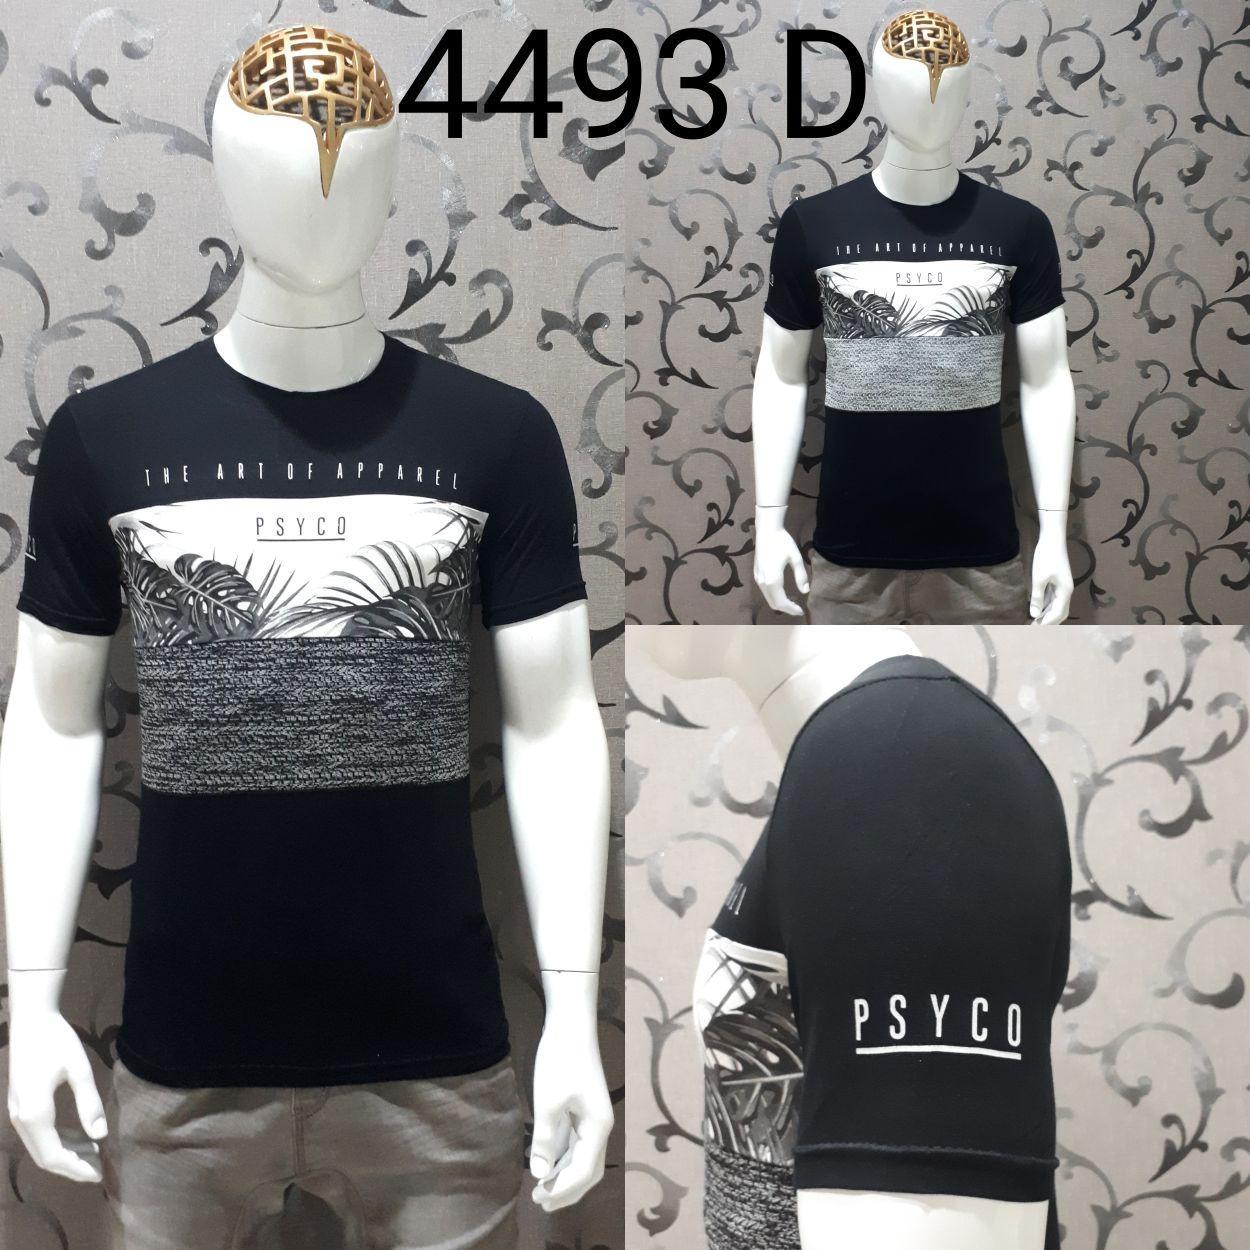 Harga mm kaos t shirt distro premium quality psyco | HARGALOKA.COM